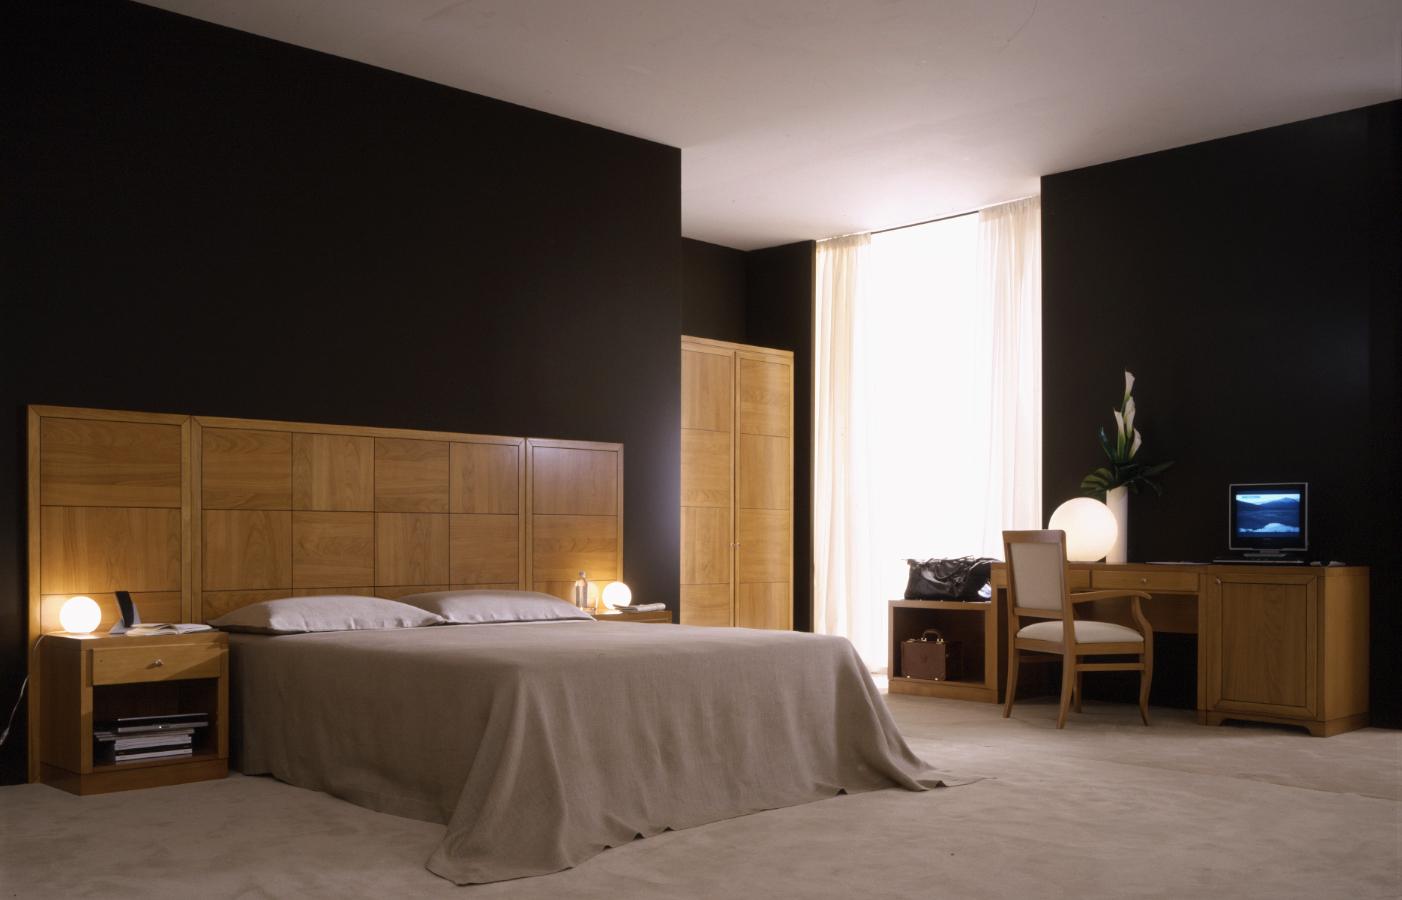 Chambre d 39 h tel contemporain 5 0 100 0 pi ces for Chambre d hotels